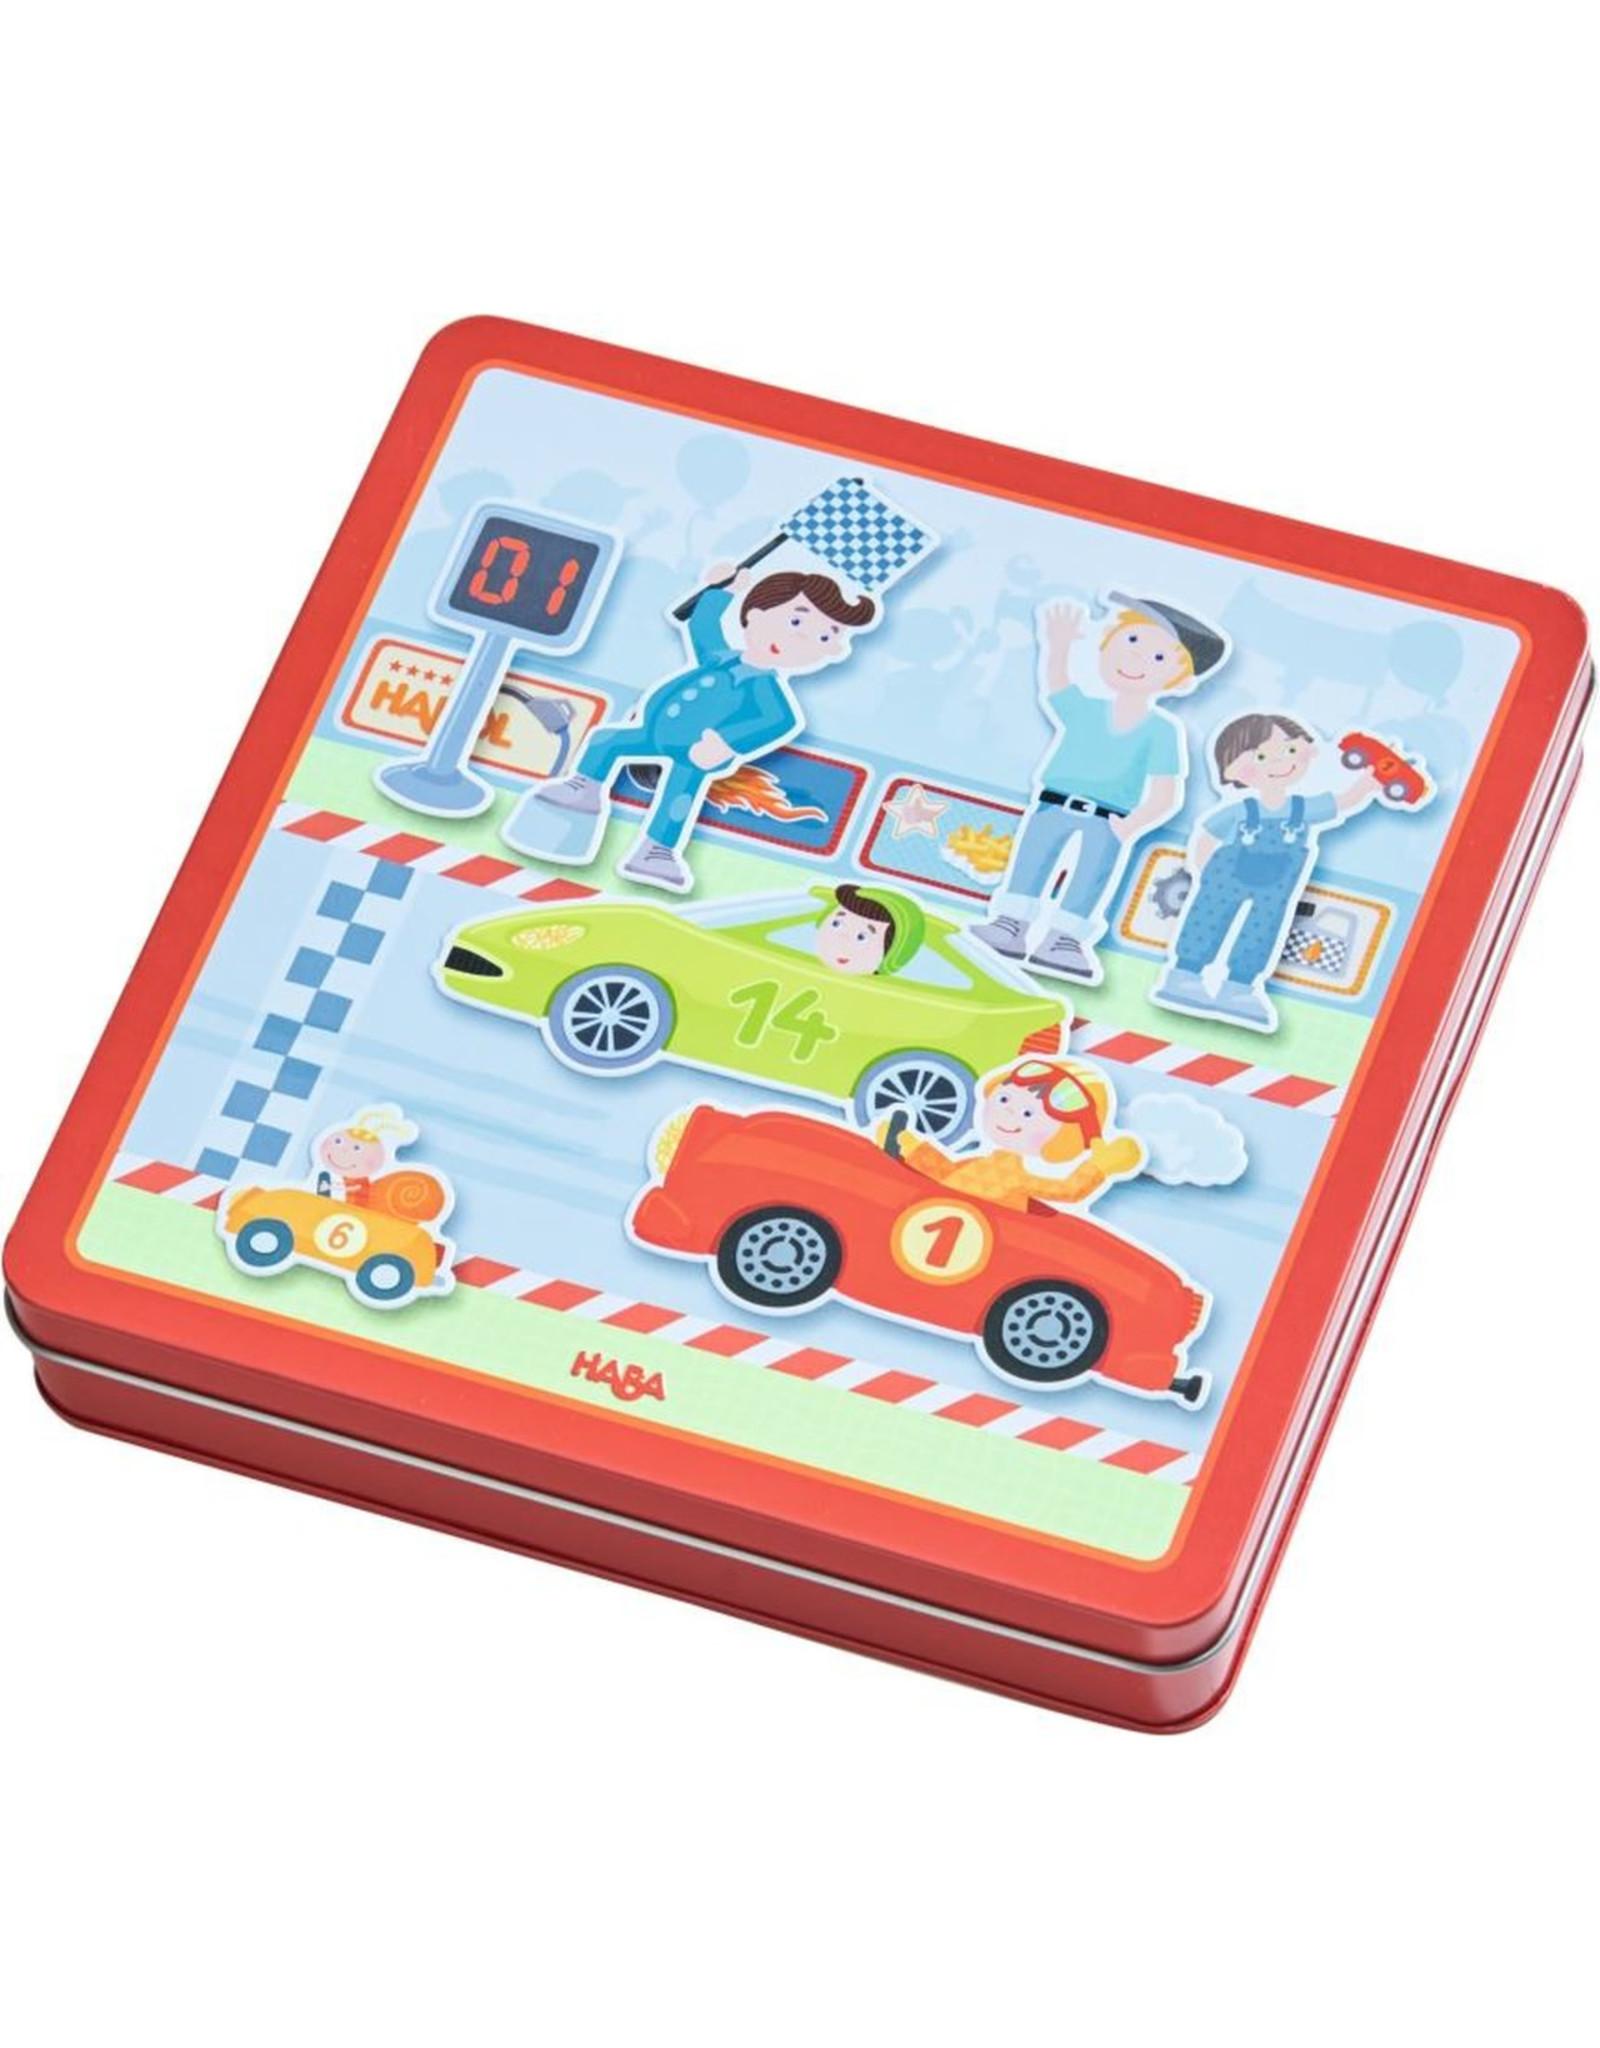 Haba Magnetic Game Box, Zippy Cars